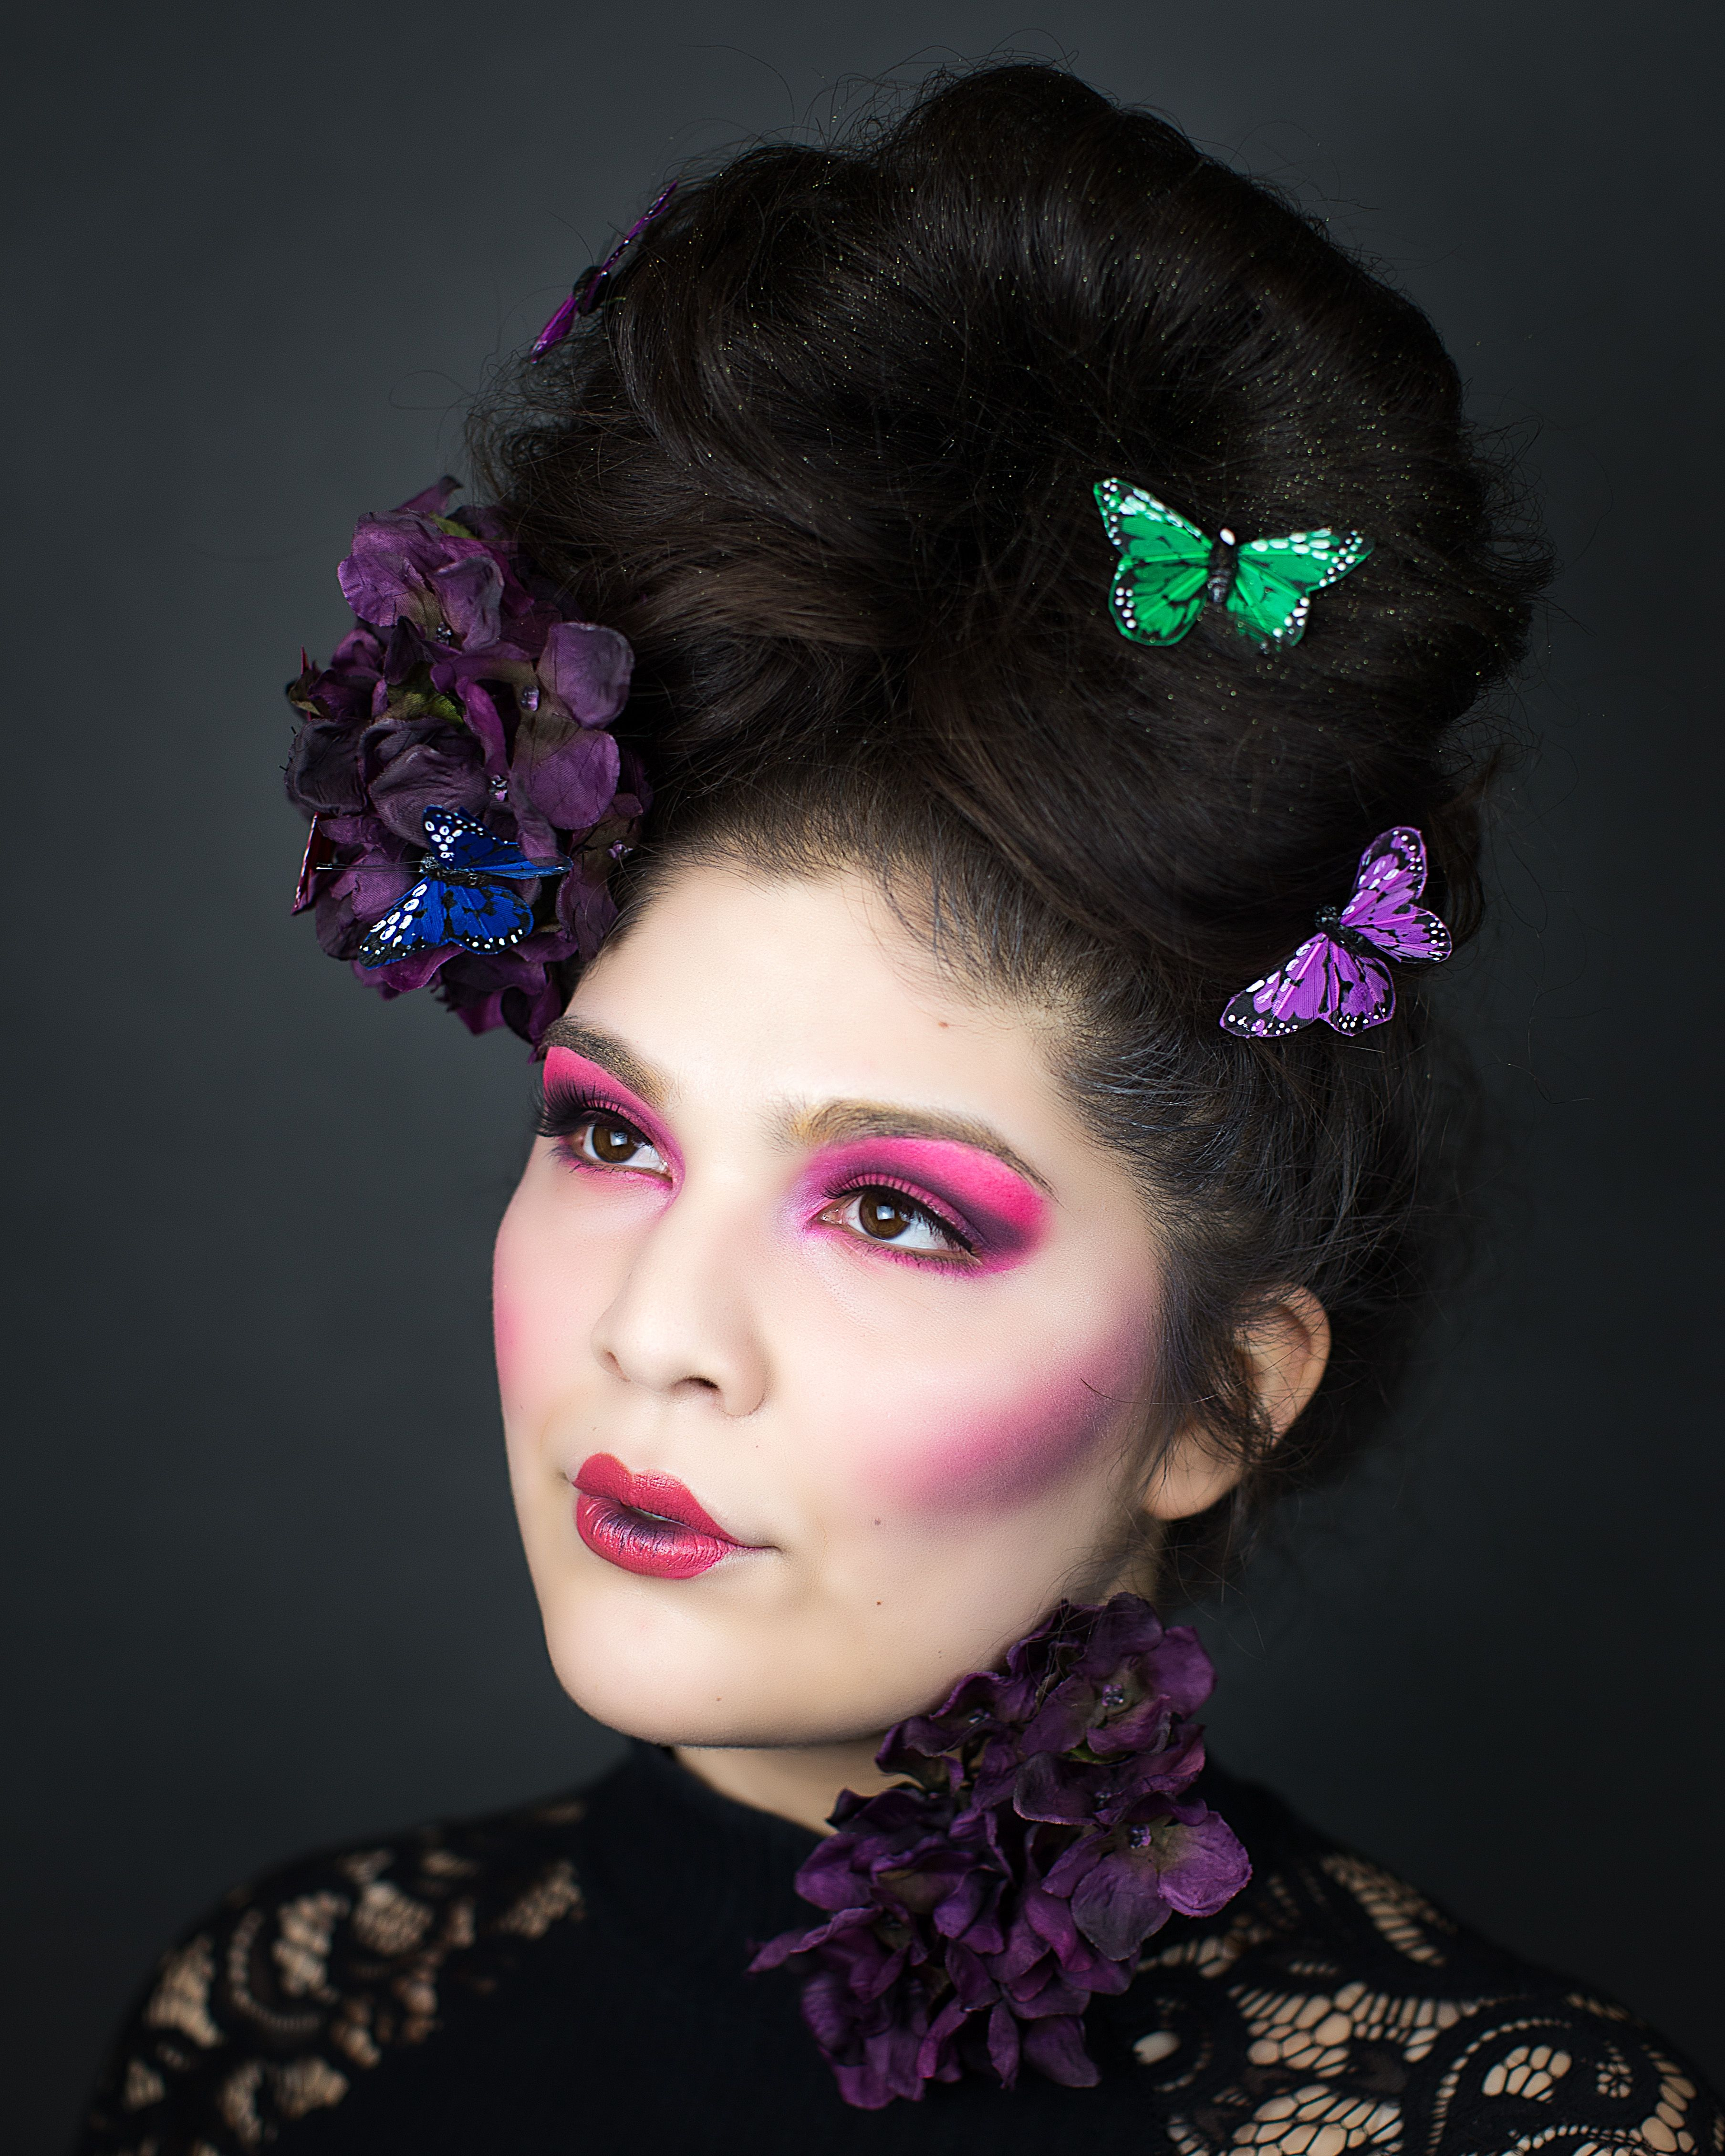 Makeup artist school austin tx with images makeup